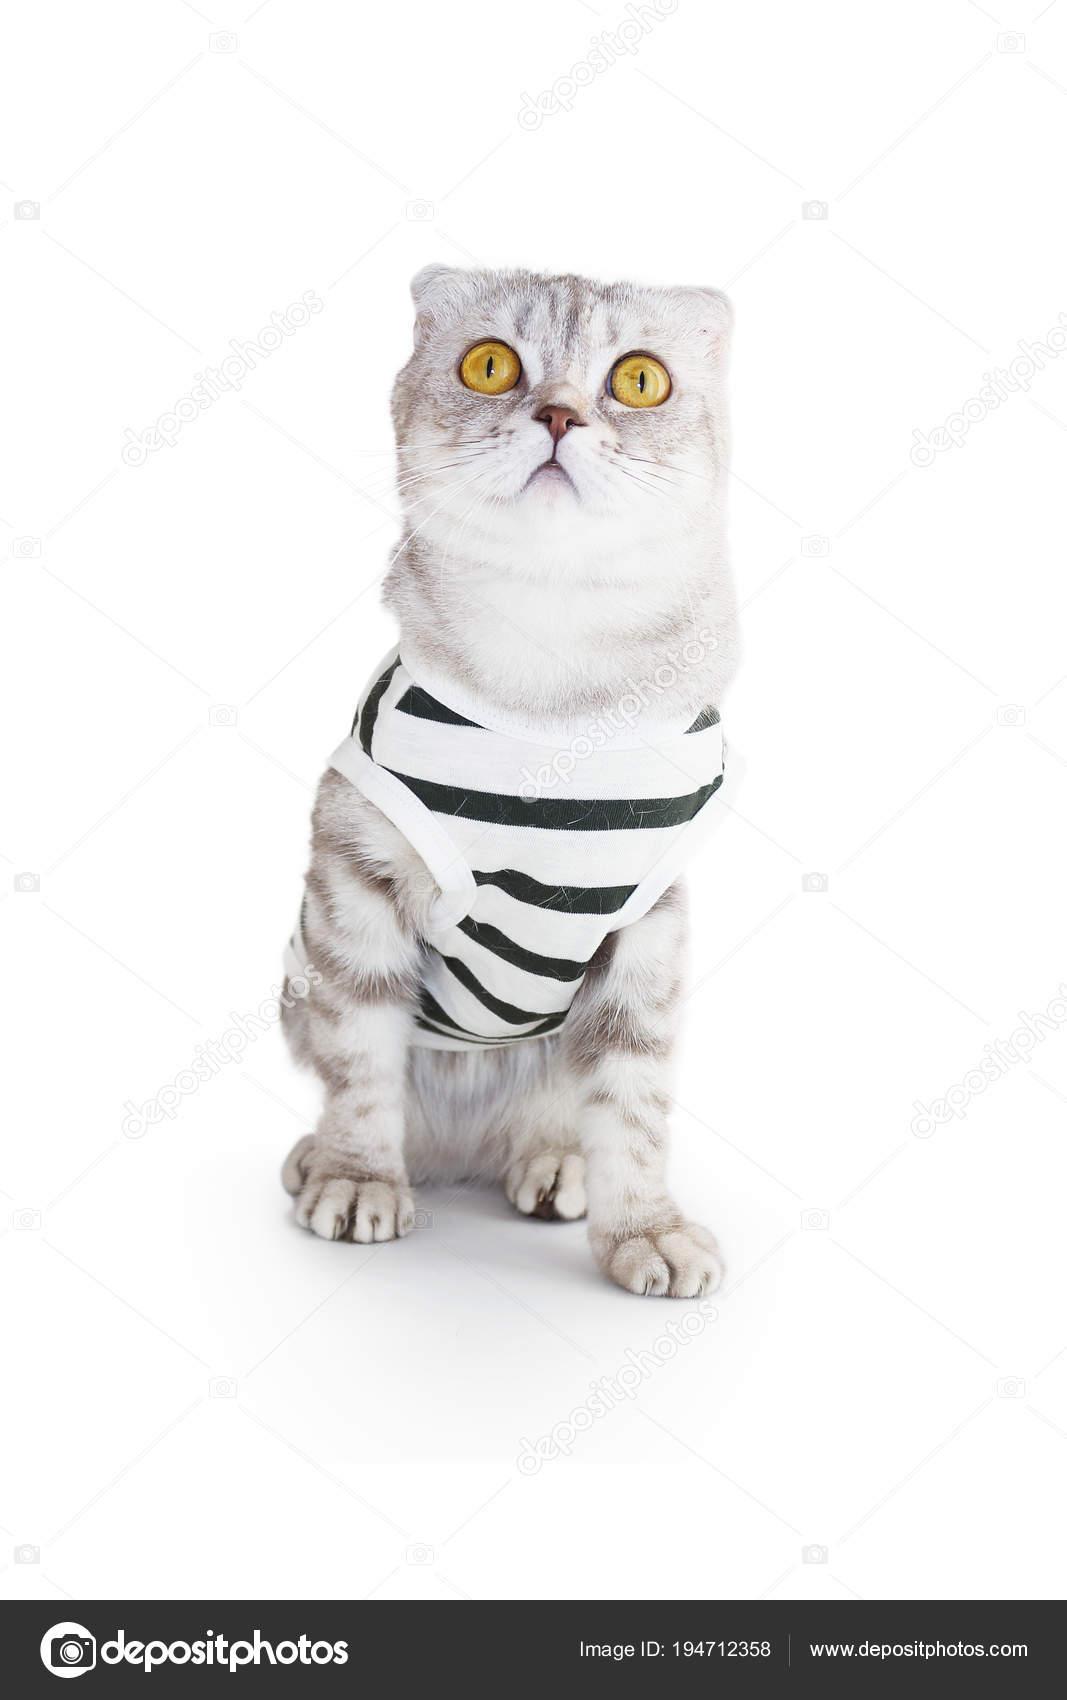 dca05b8bd088 γάτα σε ρούχα σε λευκό φόντο — Φωτογραφία Αρχείου © Doriti  194712358